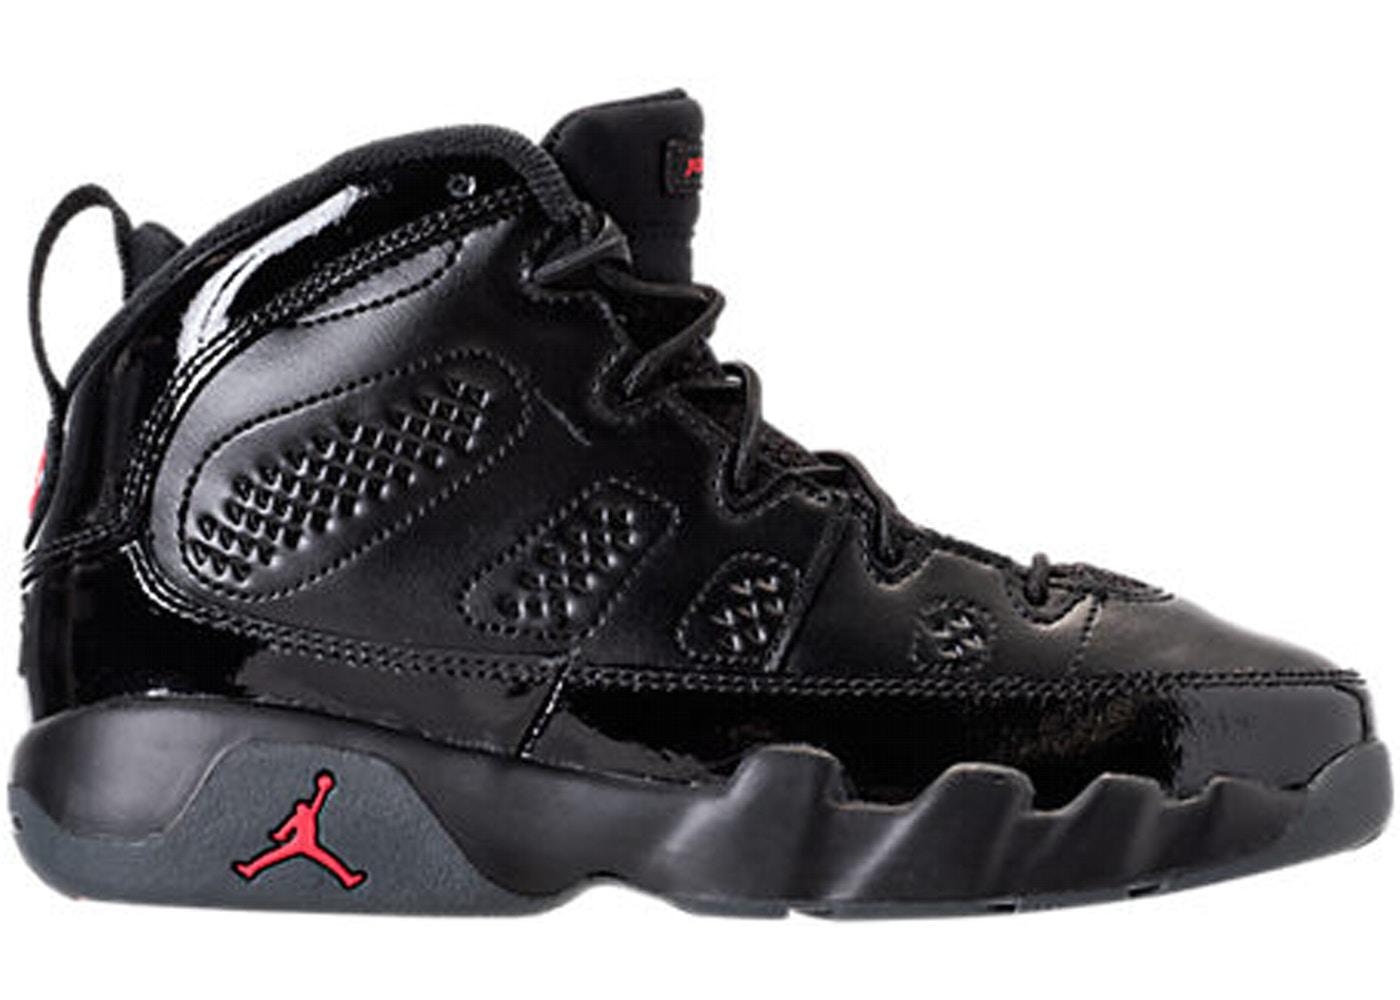 0757a2adfd7 Air Jordan 9 Shoes - Release Date